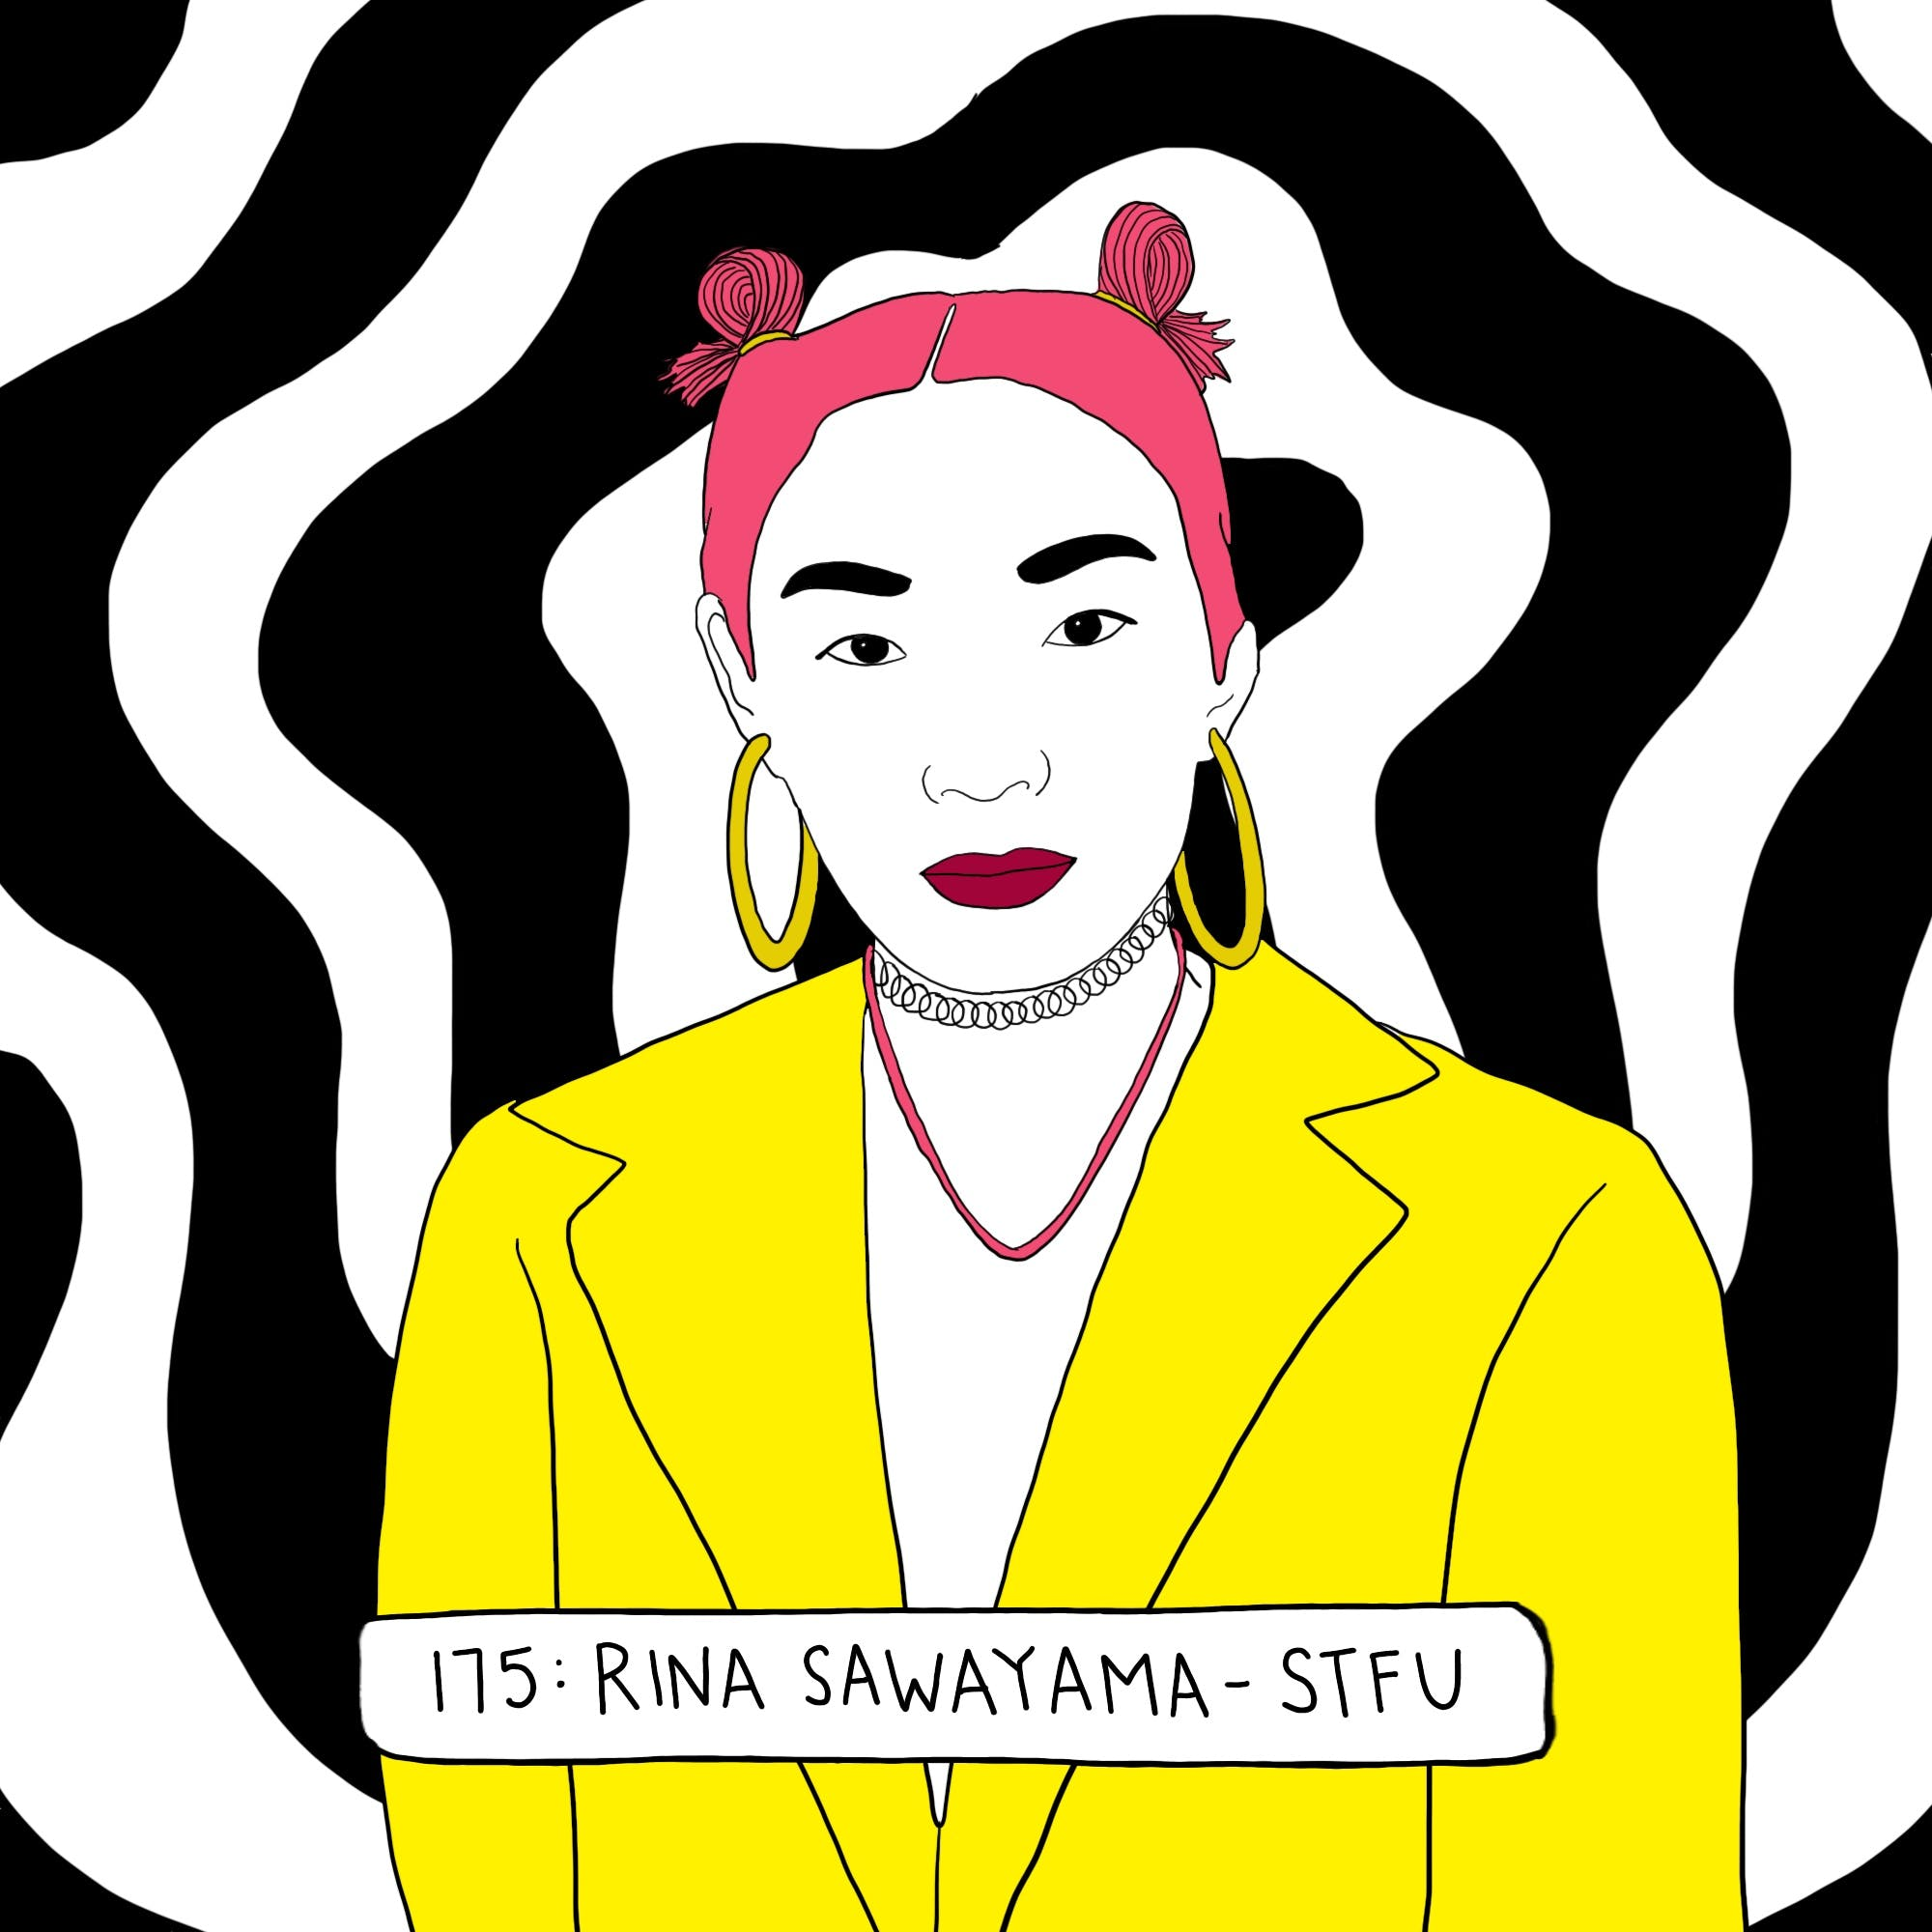 ICYMI Rina Sawayama Reimagines the 00s